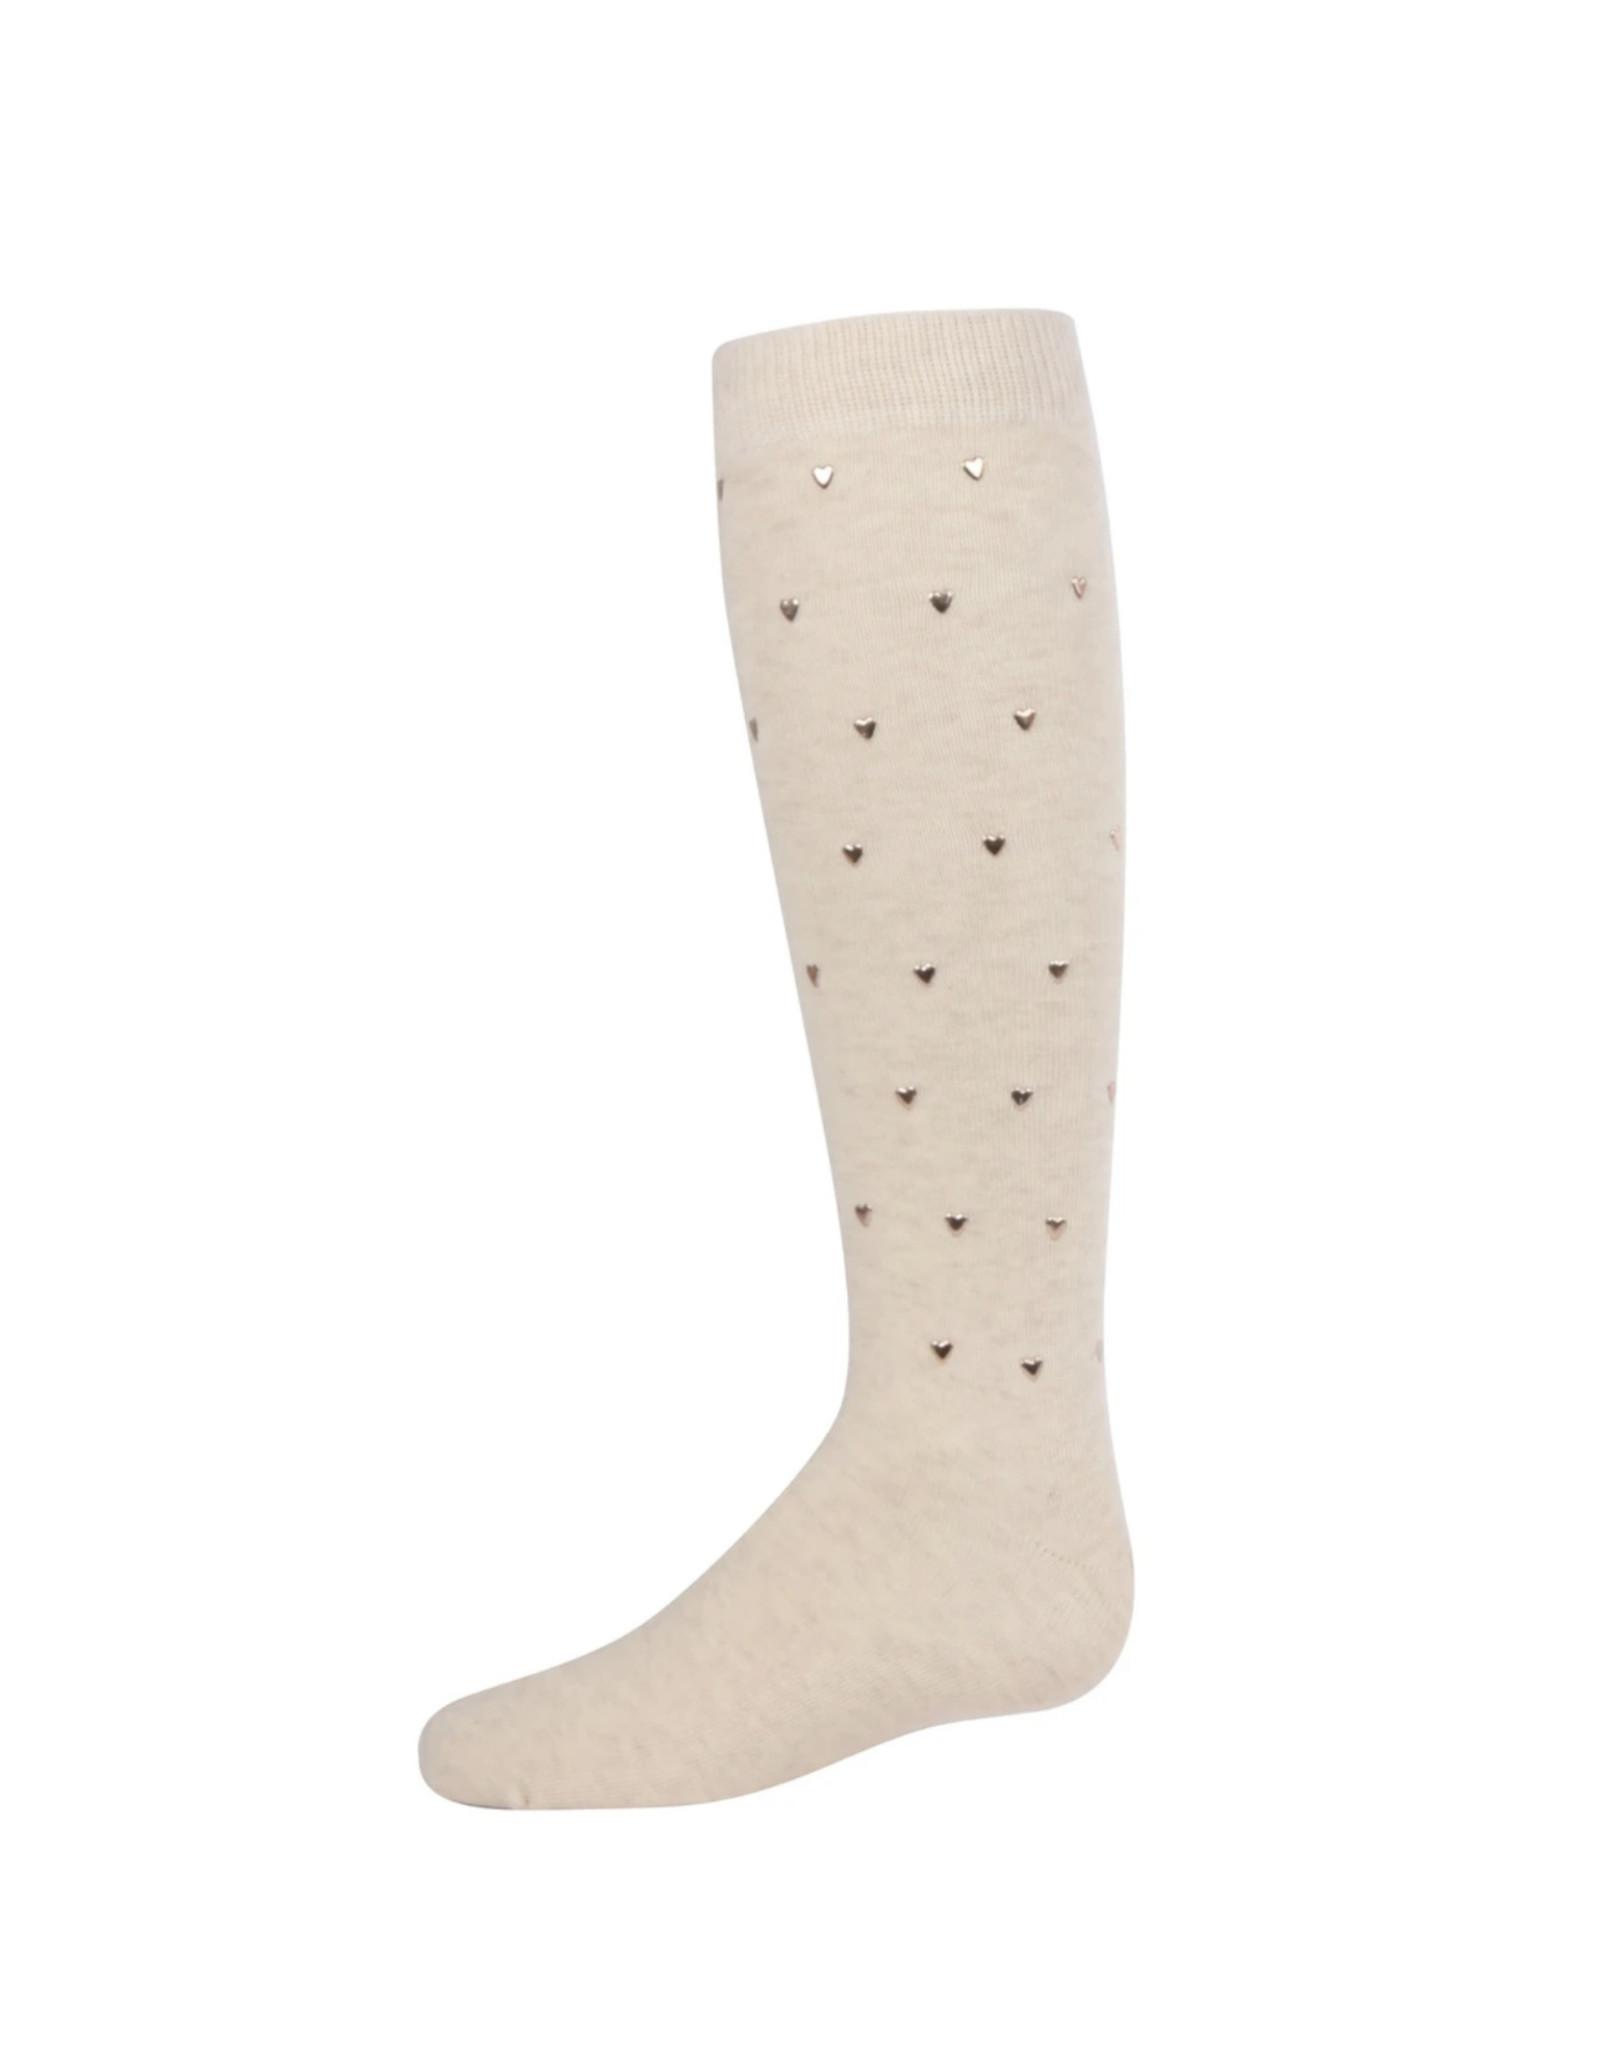 Memoi Memoi Girls Heart Stud Knee Sock